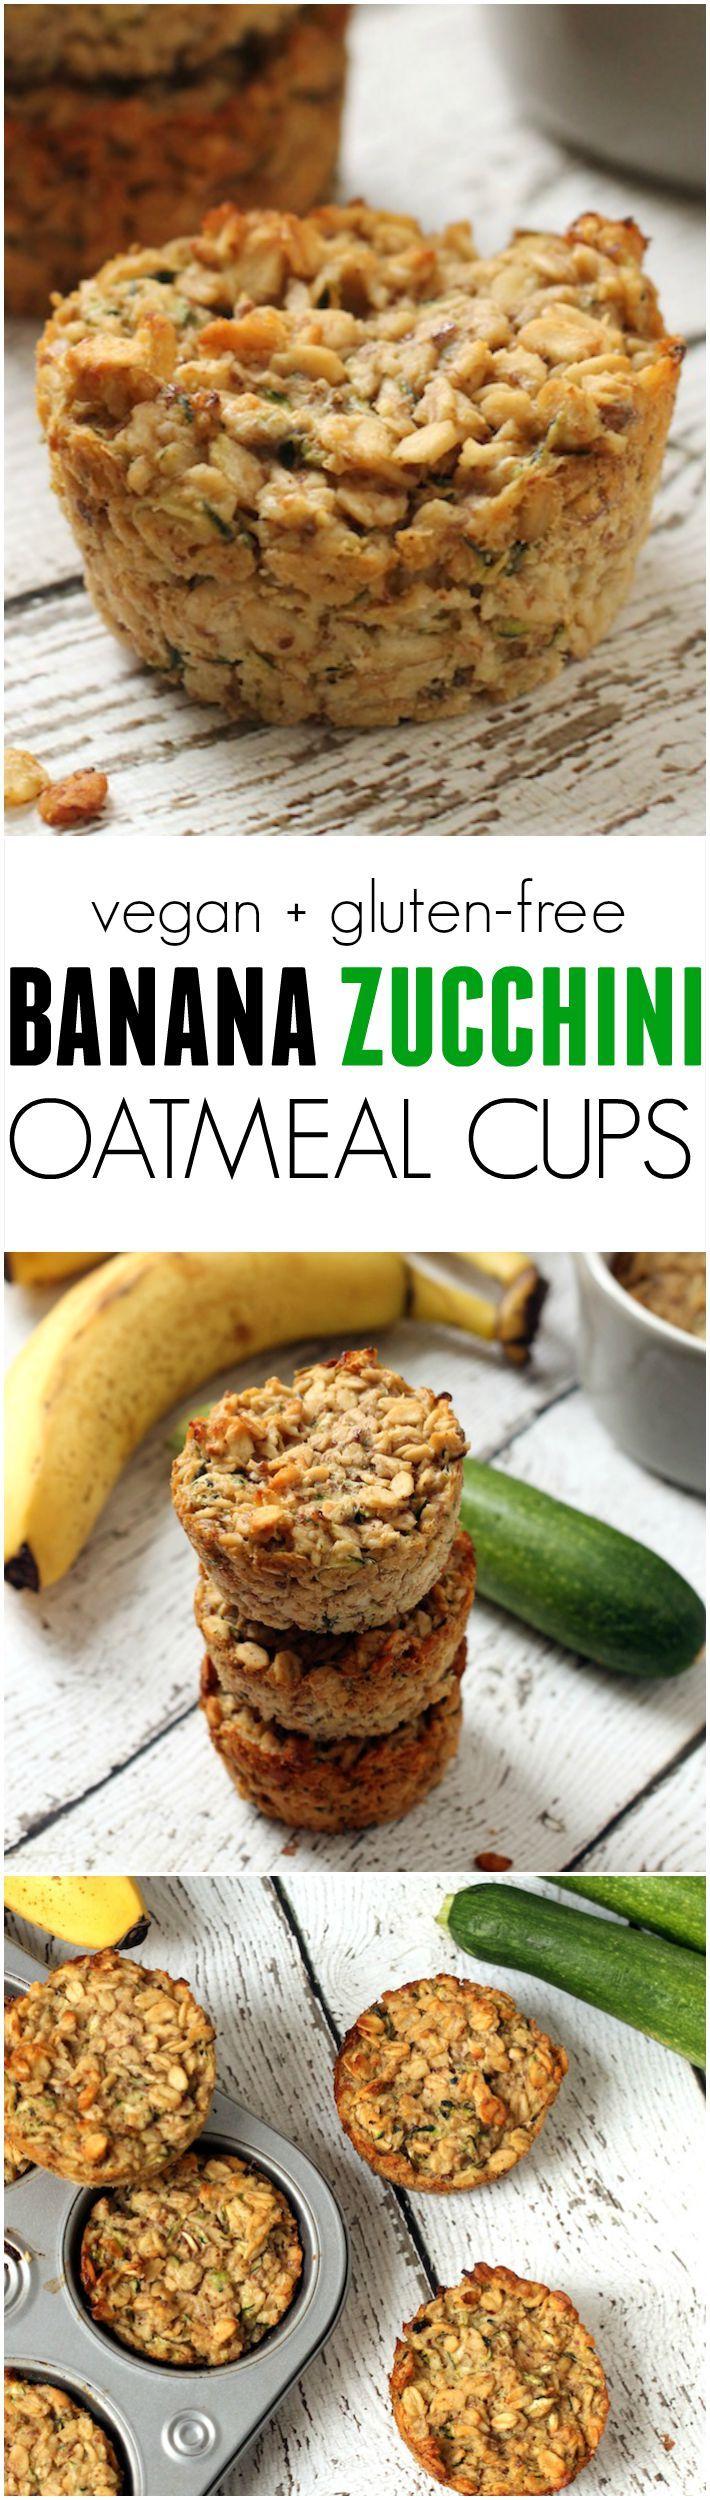 banana zucchini oatmeal cups recipe healthy zucchini